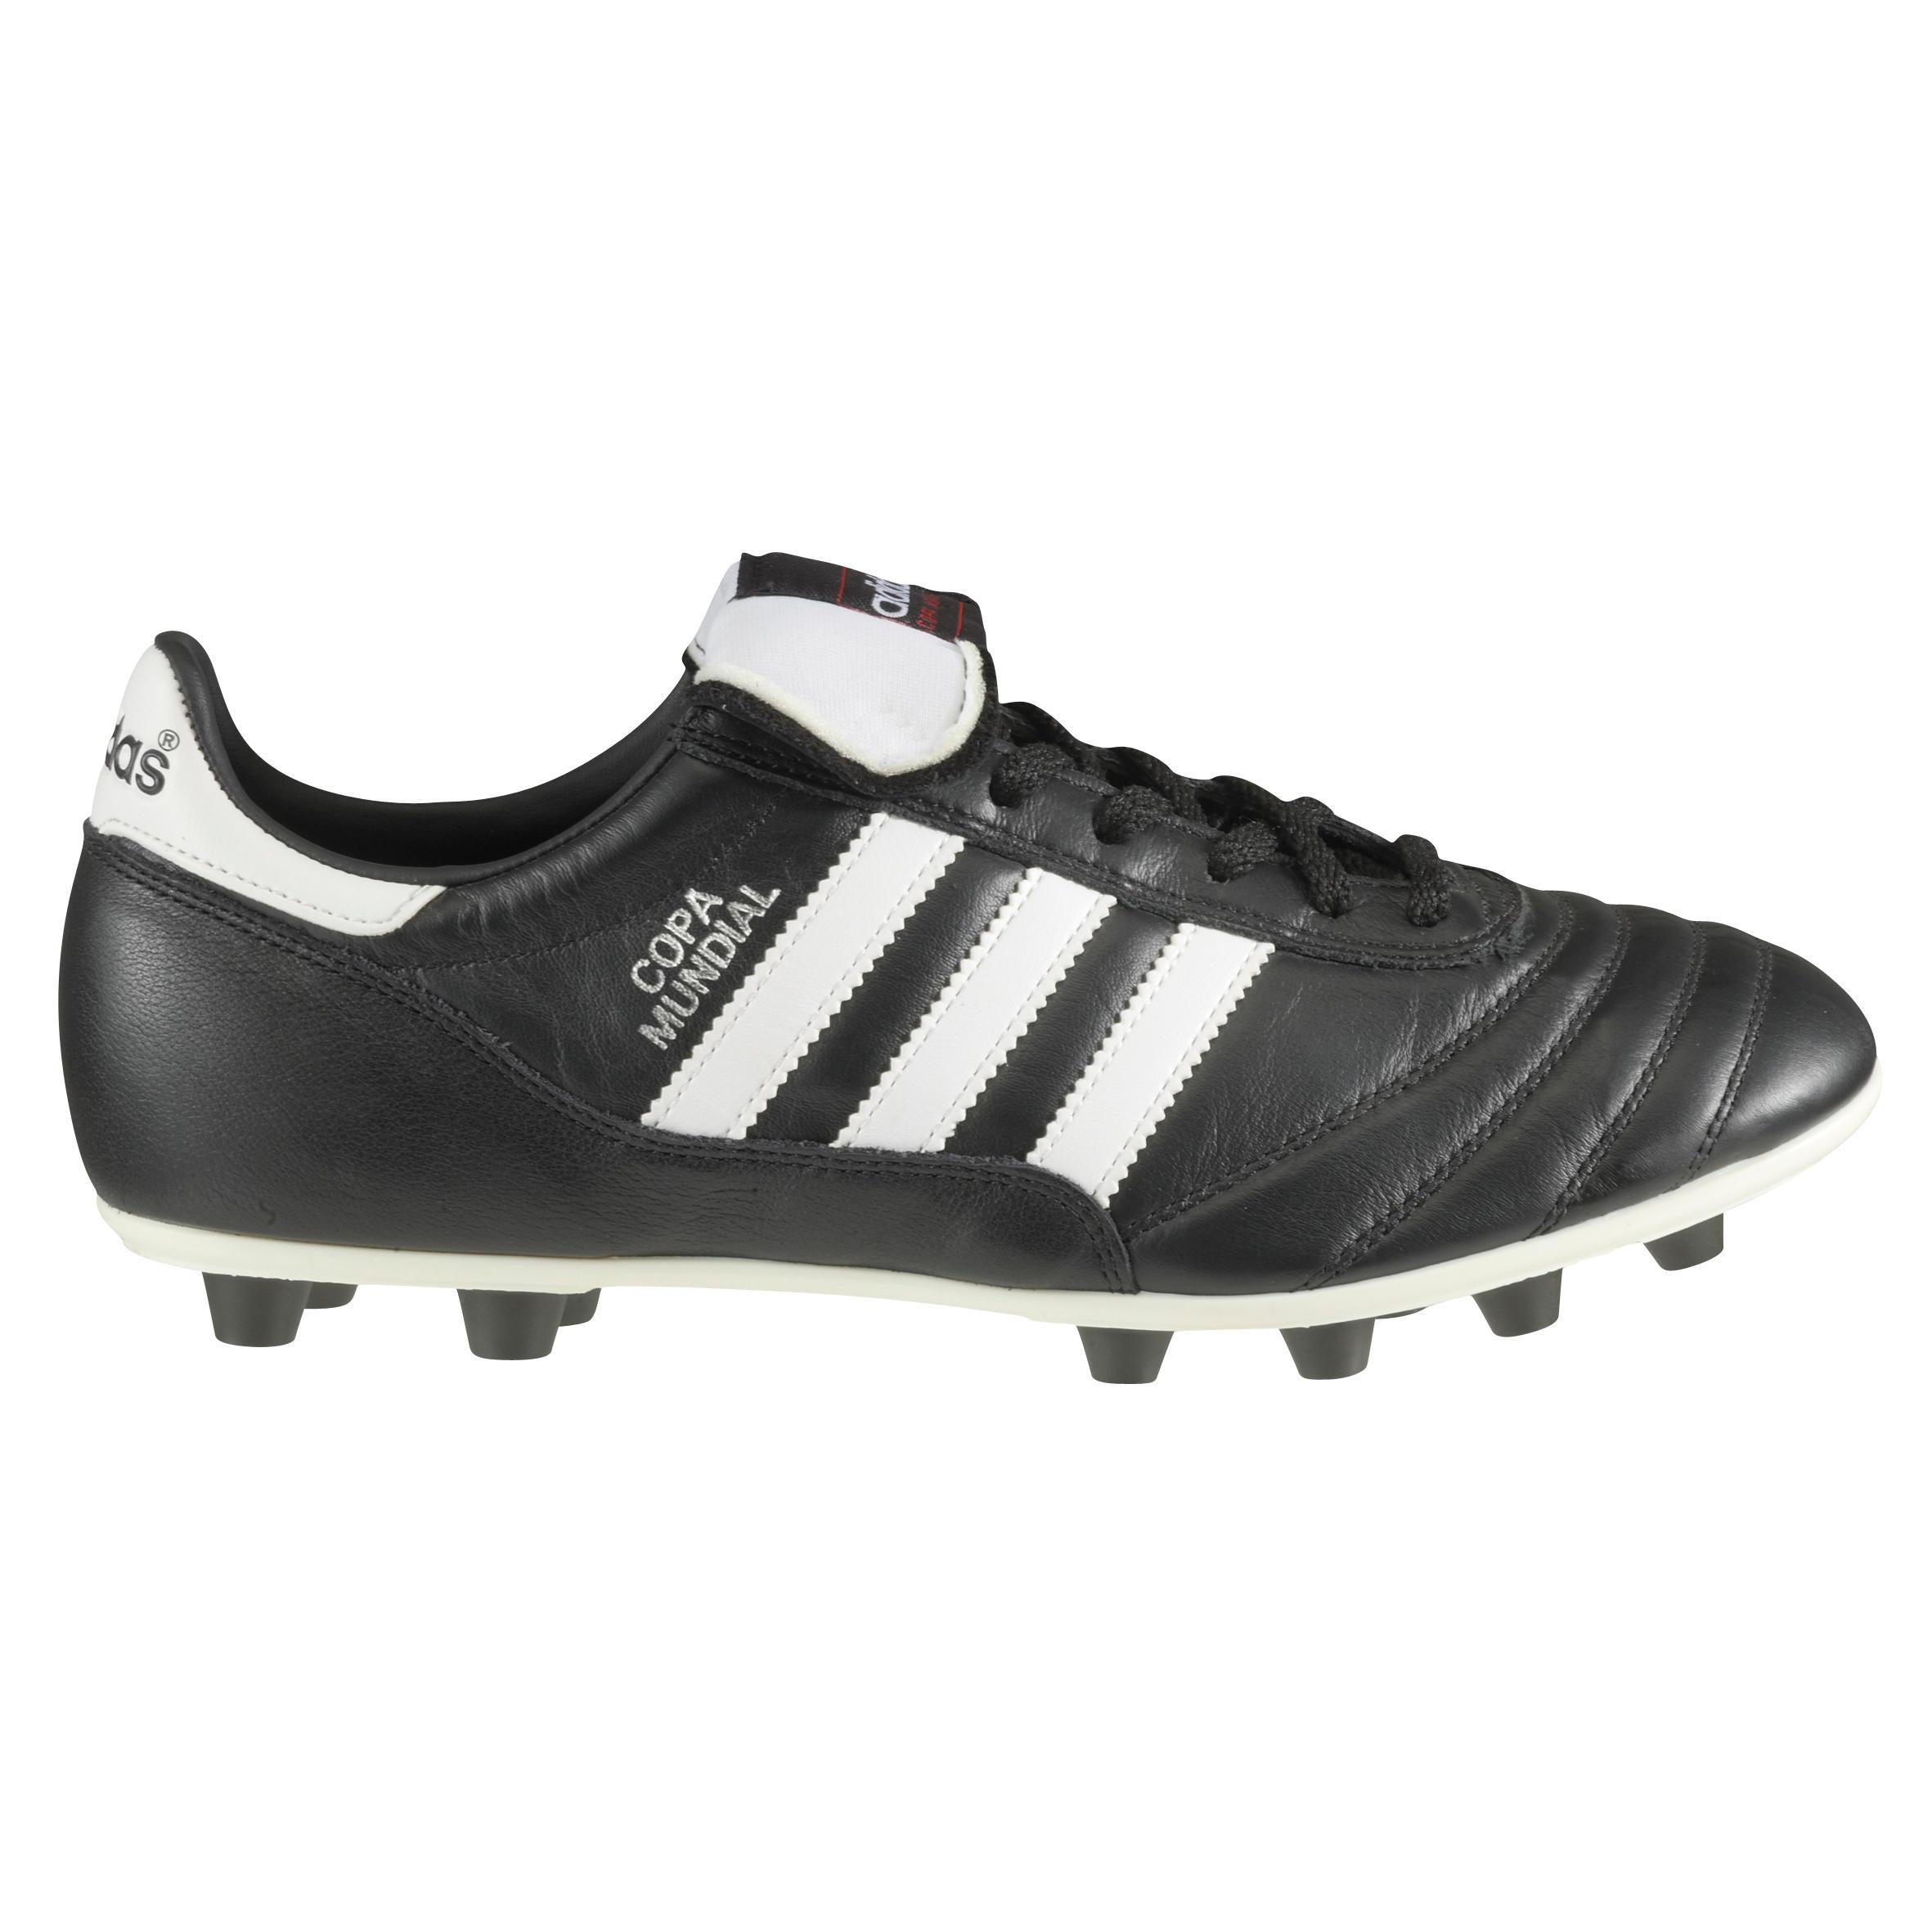 Fußballschuhe Nocken Copa Mundial FG Erwachsene schwarz | Schuhe > Sportschuhe > Fußballschuhe | Adidas